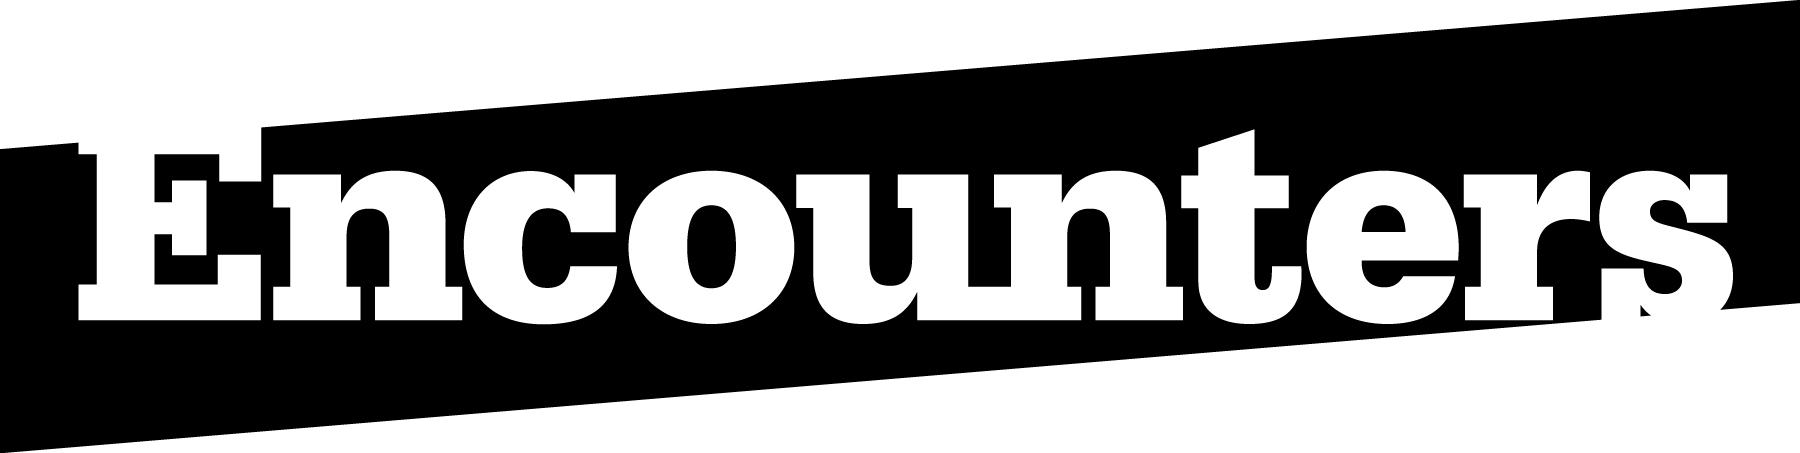 Encounters logo